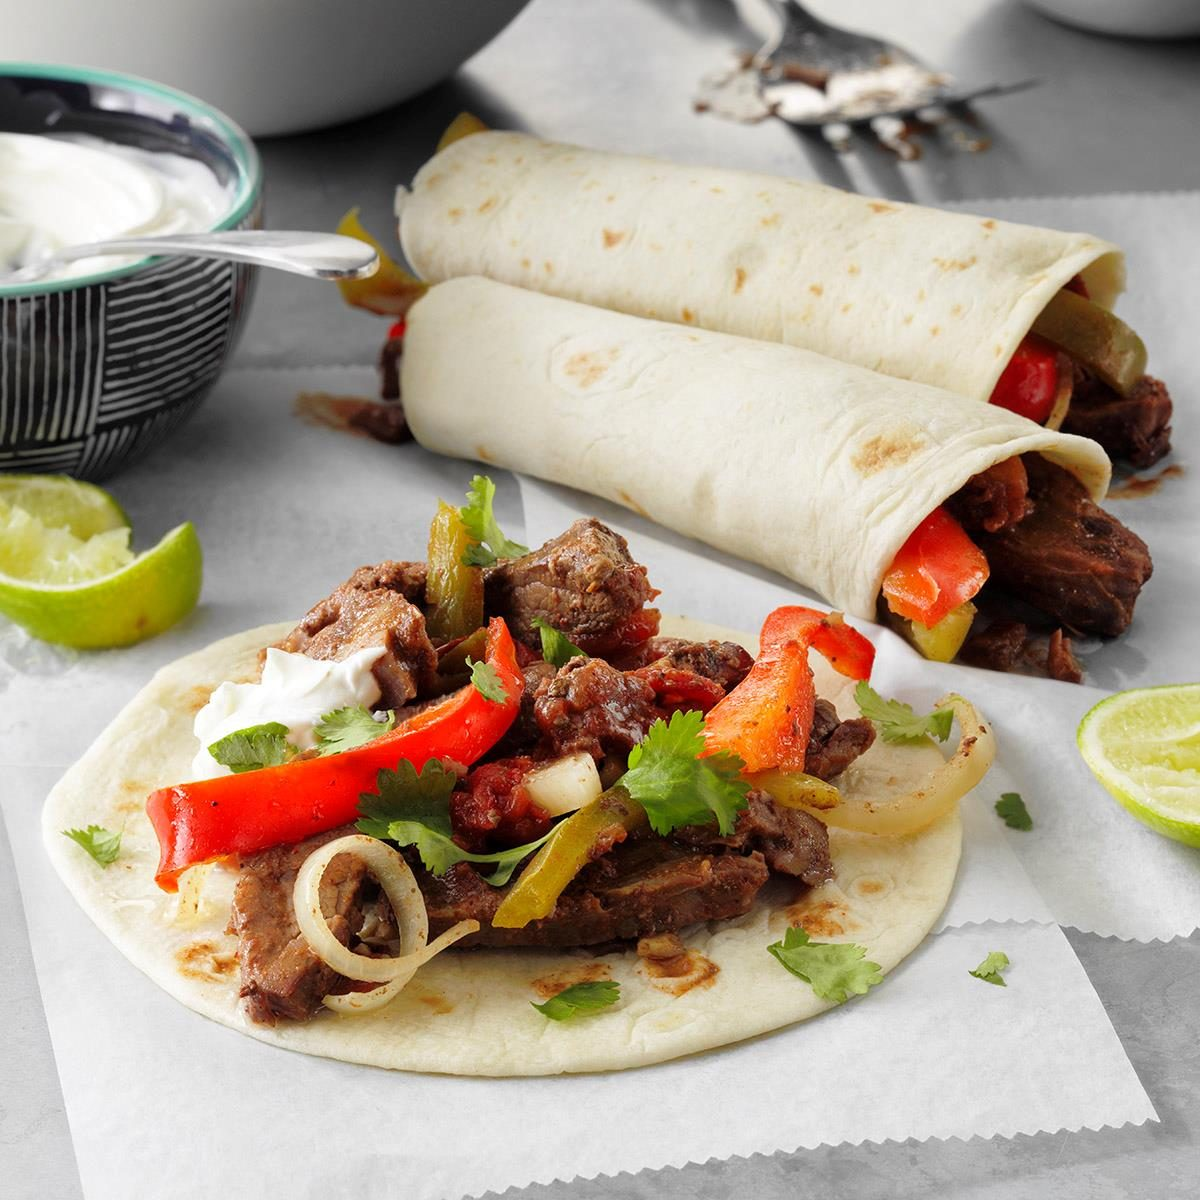 Slow Cooked Steak Fajitas Exps Scsbz21 17541 E01 21 4b 2